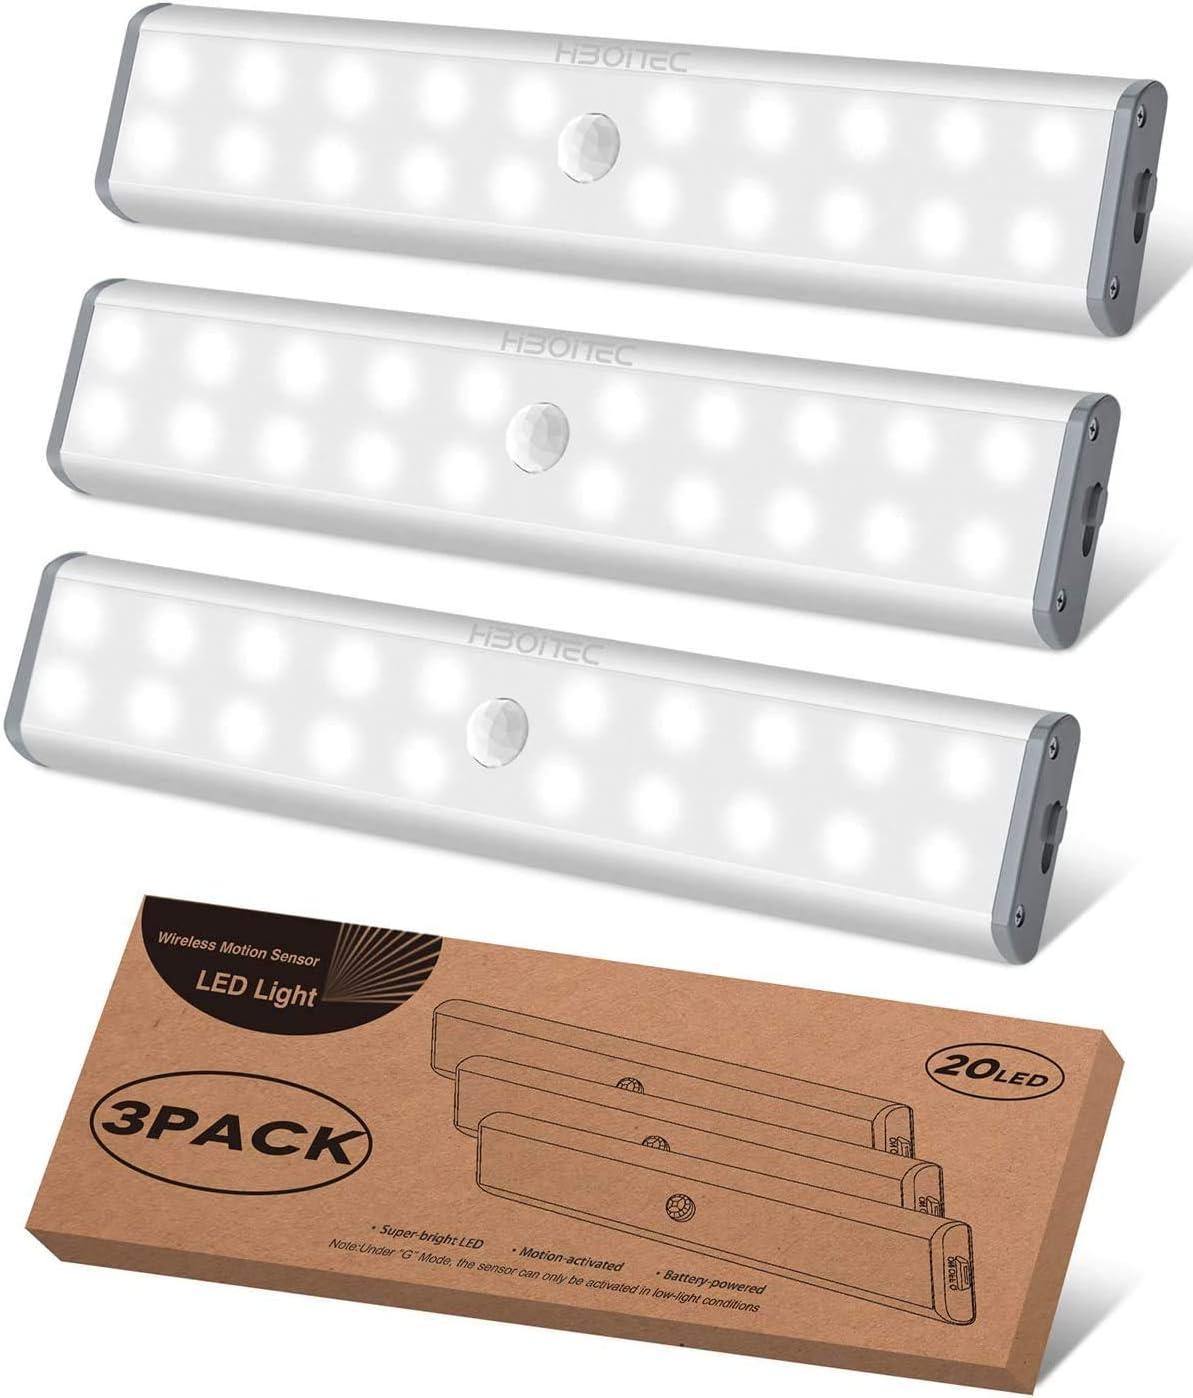 Luz Armario con Sensor de Movimiento Luz Sensor para Armario USB Recargable LED Armario Ideal para Armario Garaje Gabinete Escalera